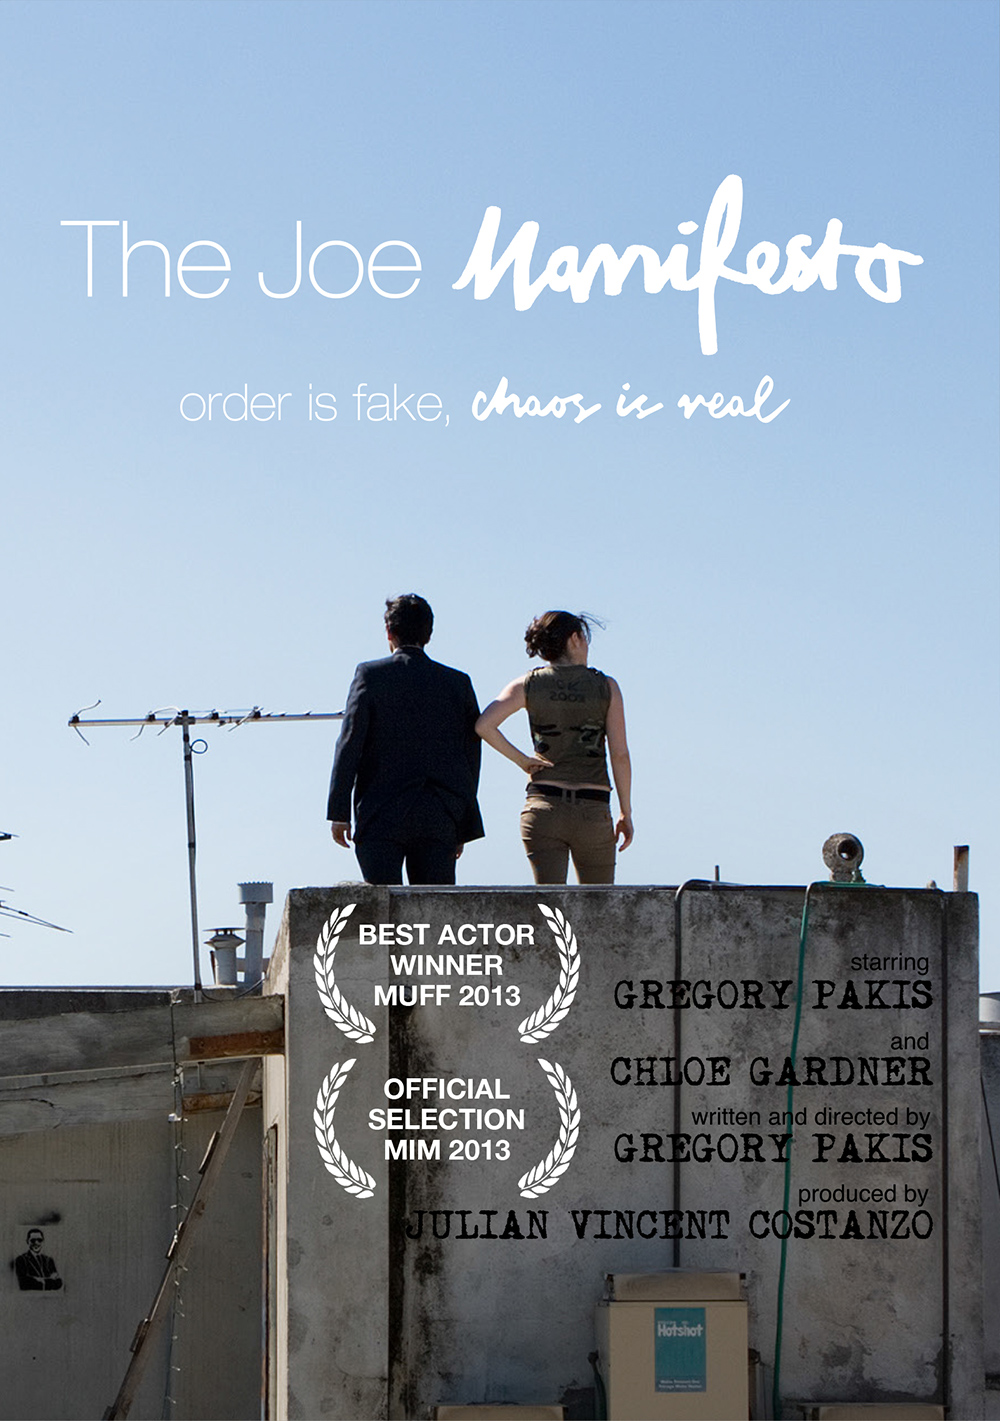 Joe-Manifesto-Poster-Image-101014(1000x1421)